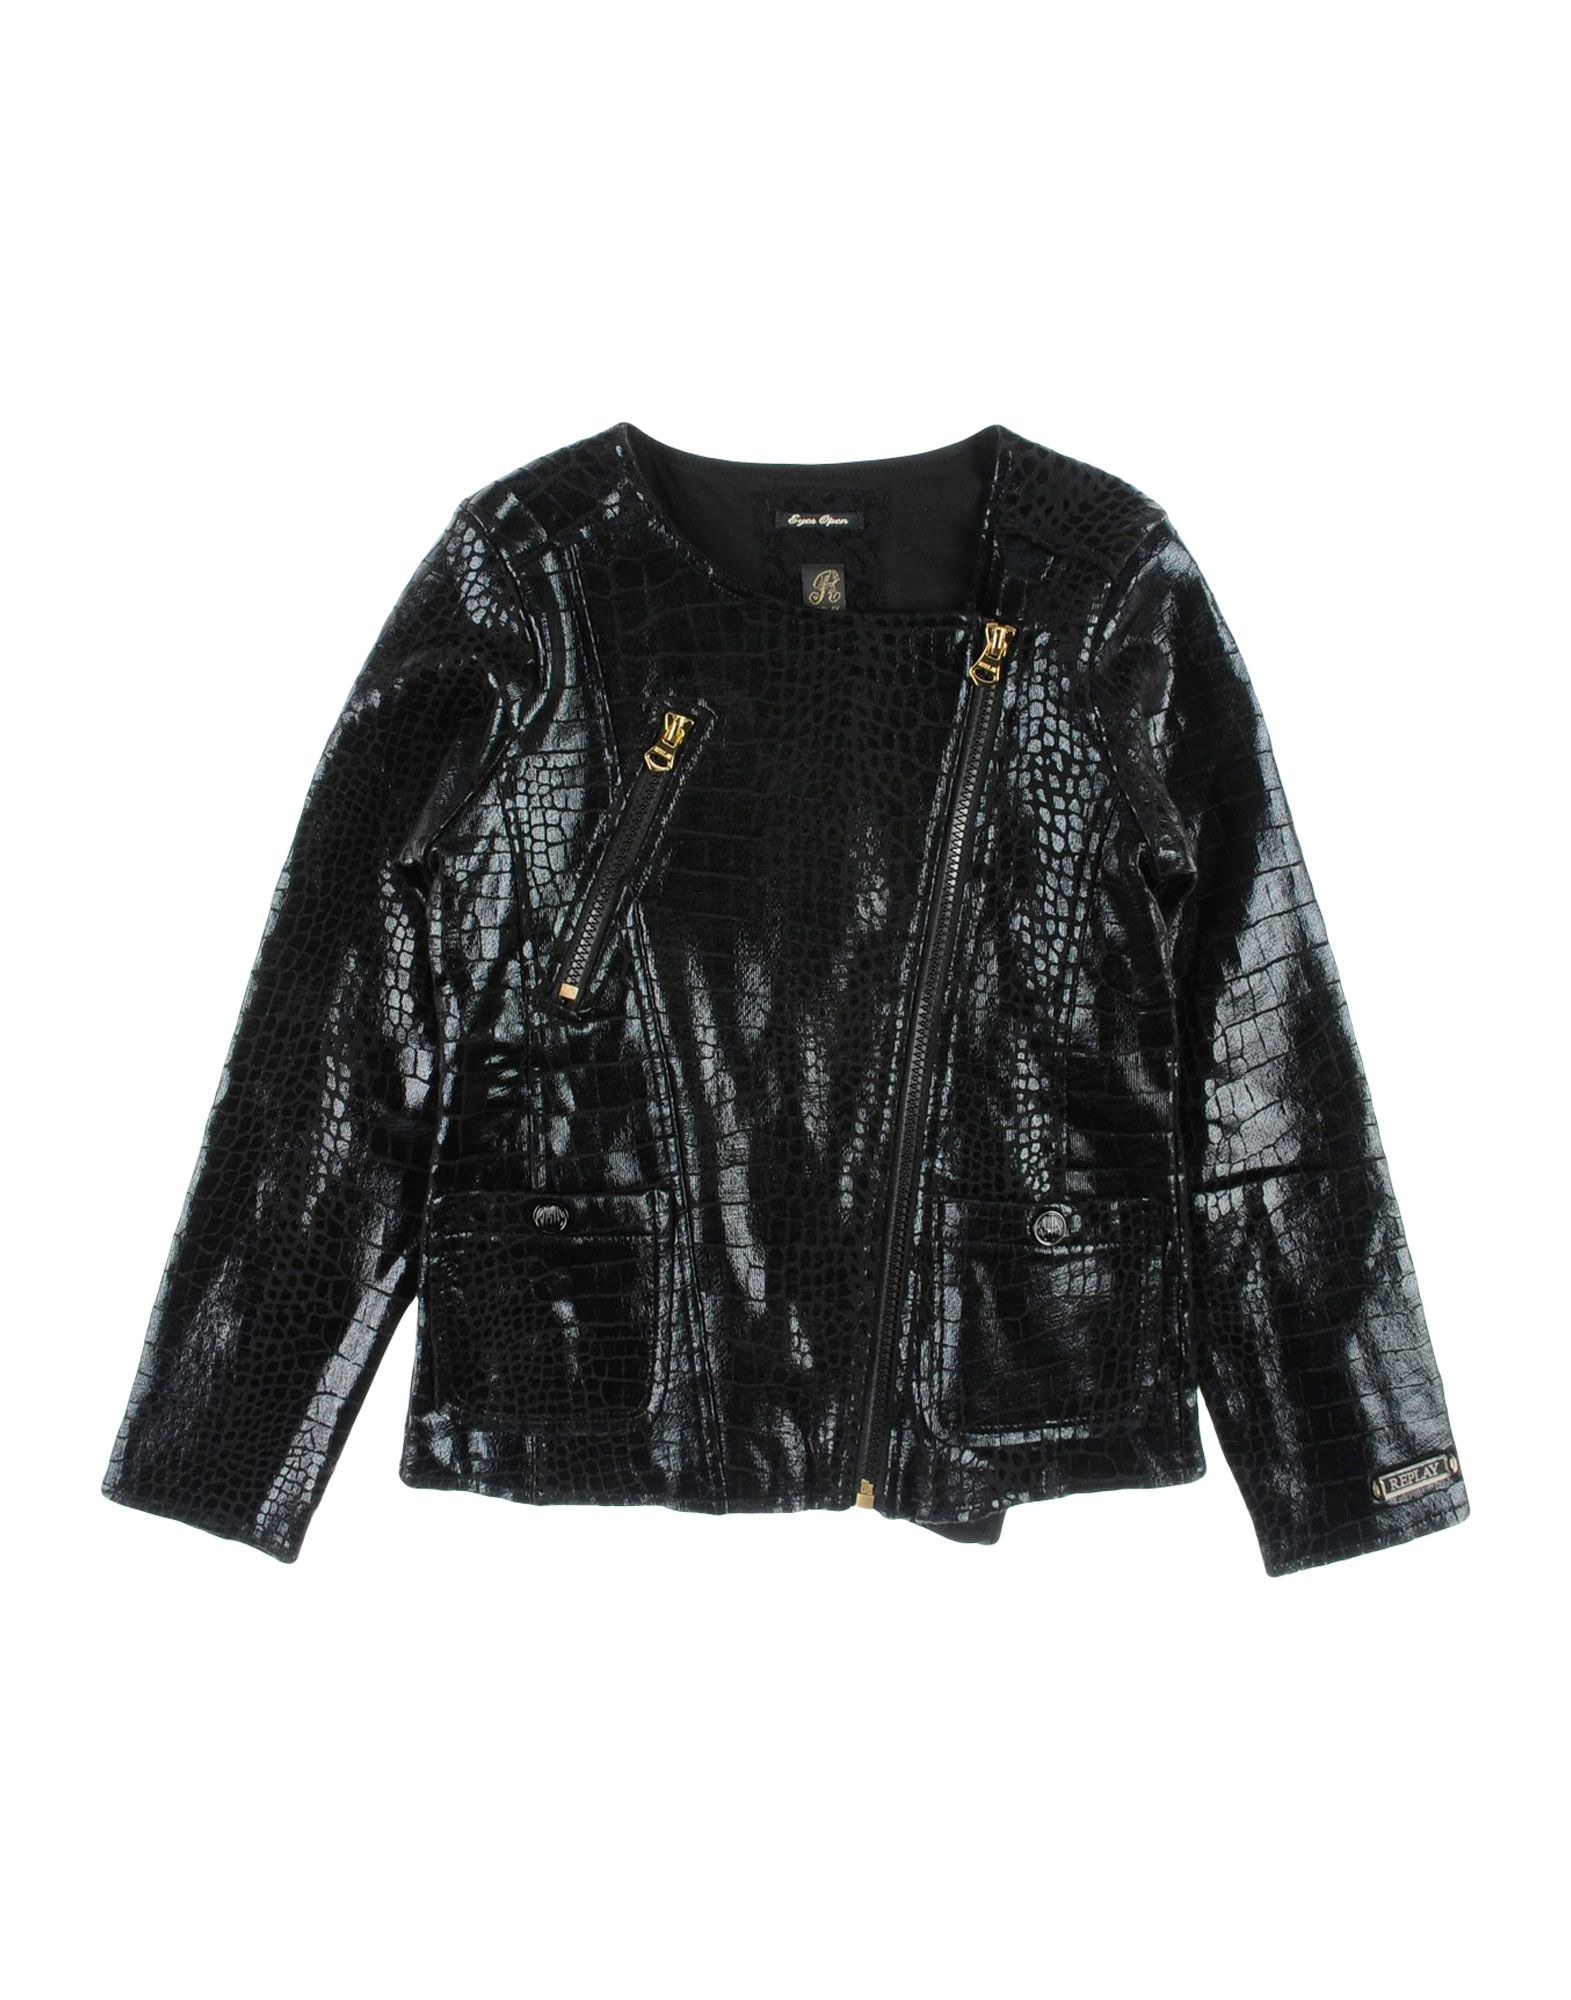 REPLAY Biker Jacket in Black